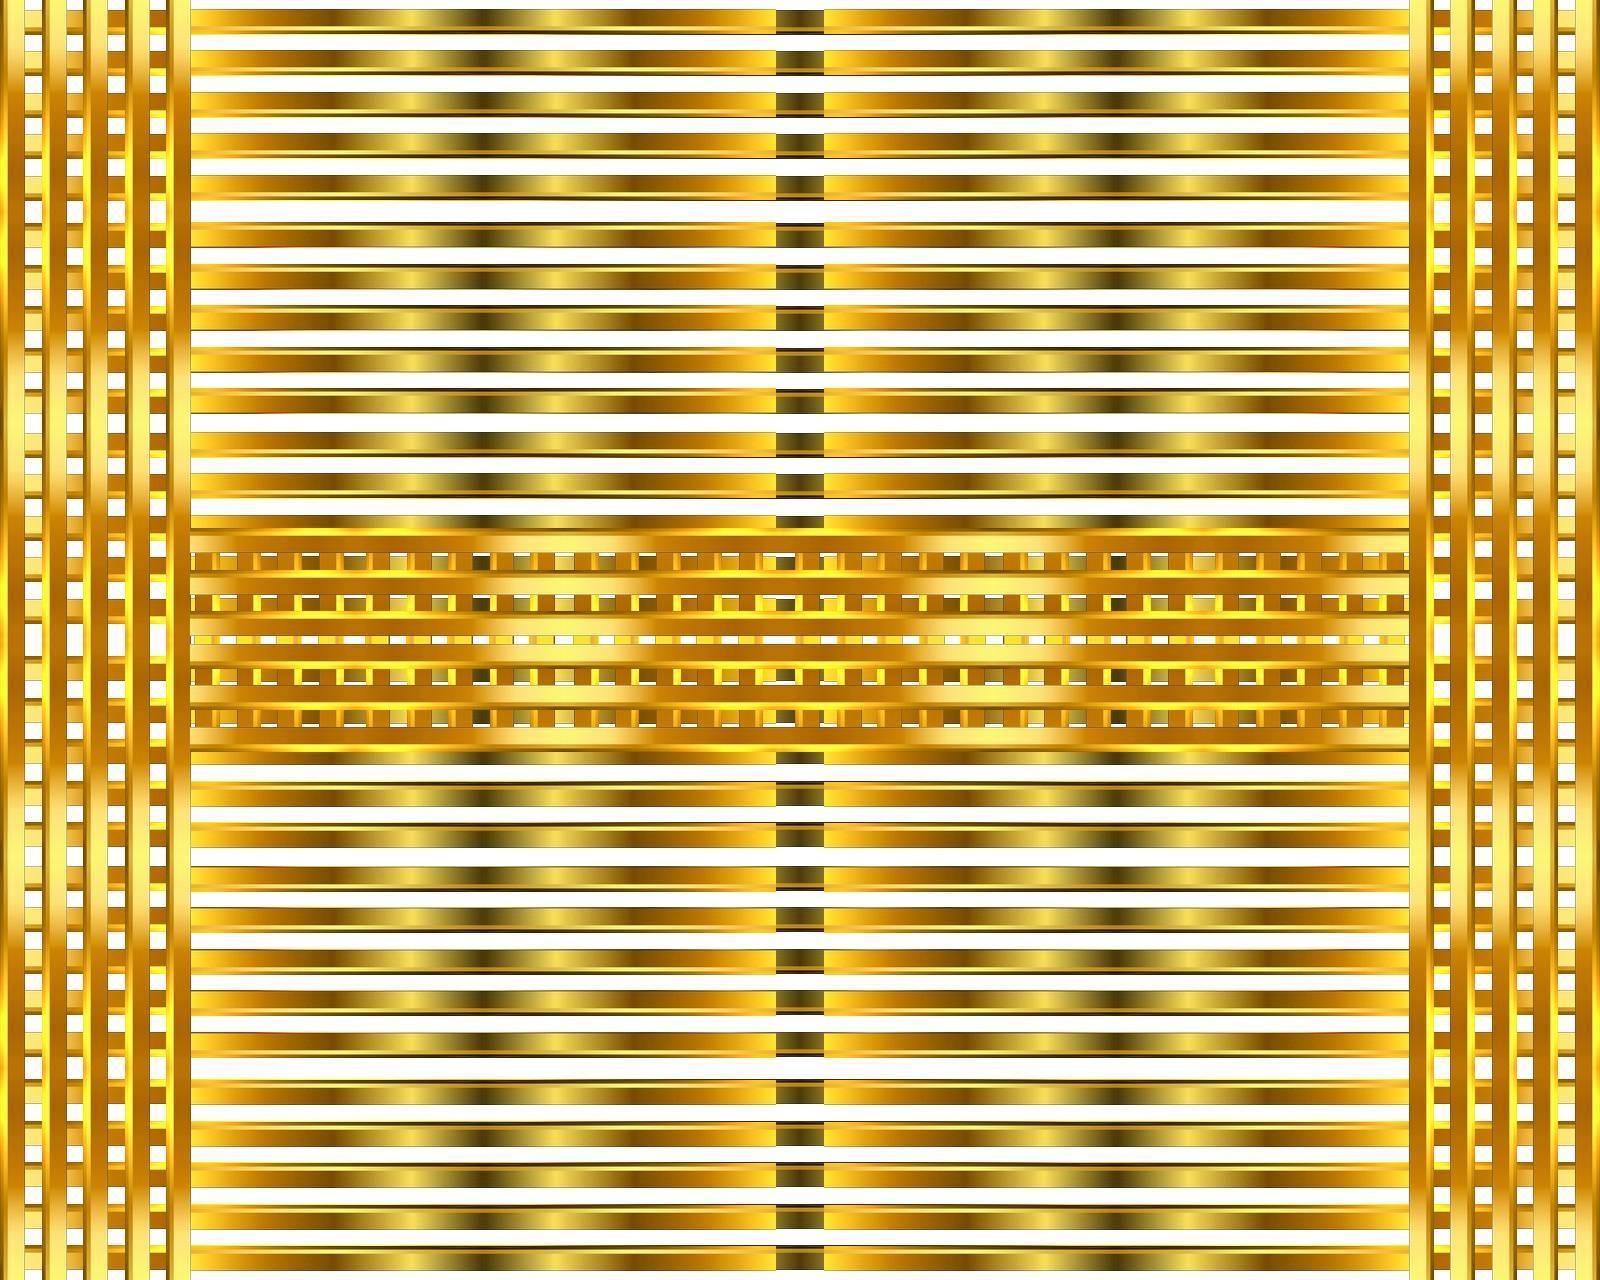 Gold H